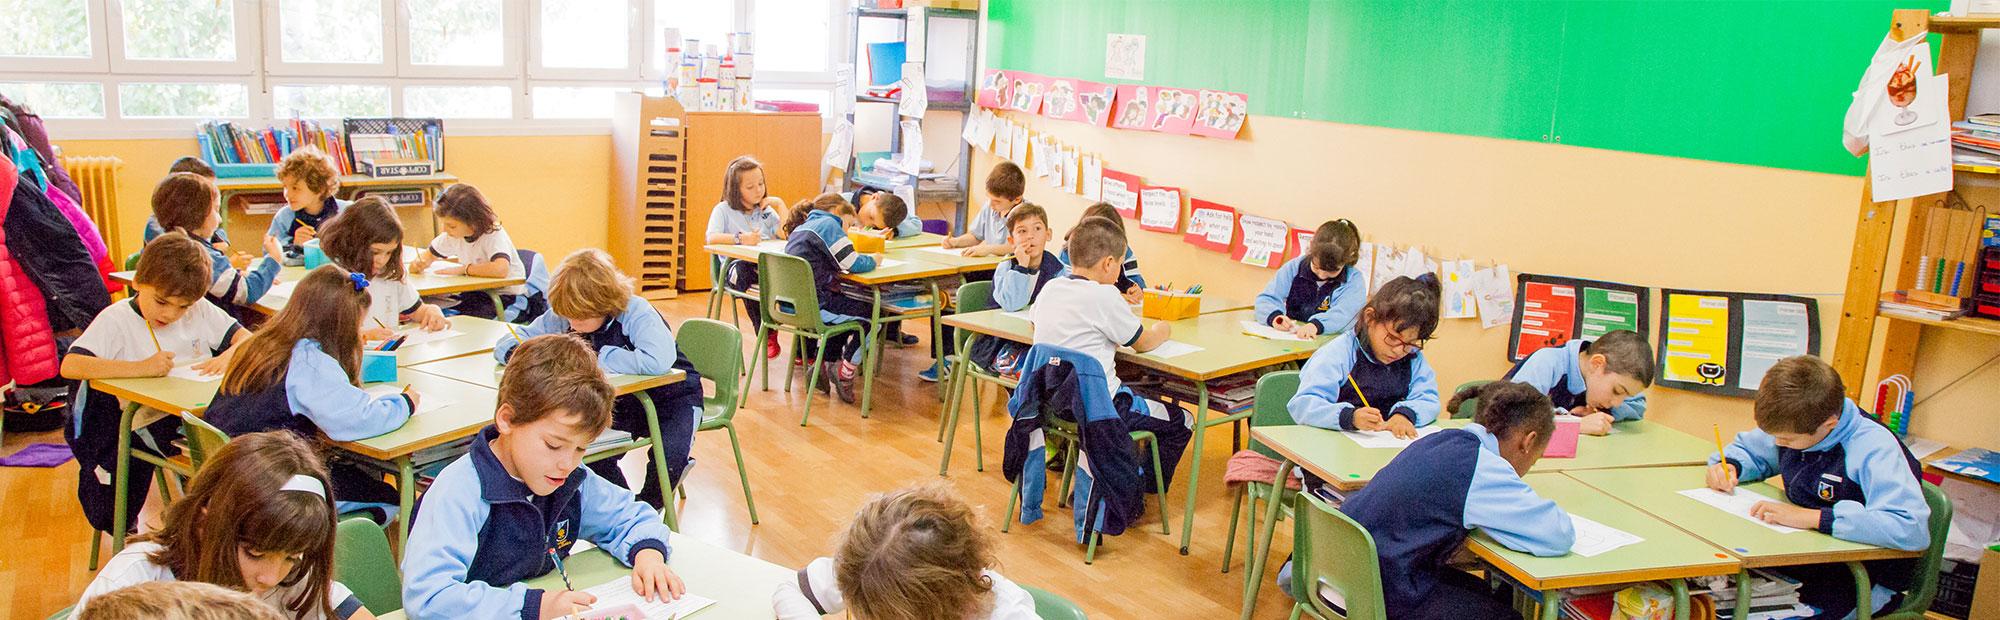 Matrícula Educación Infantil 2016-2017